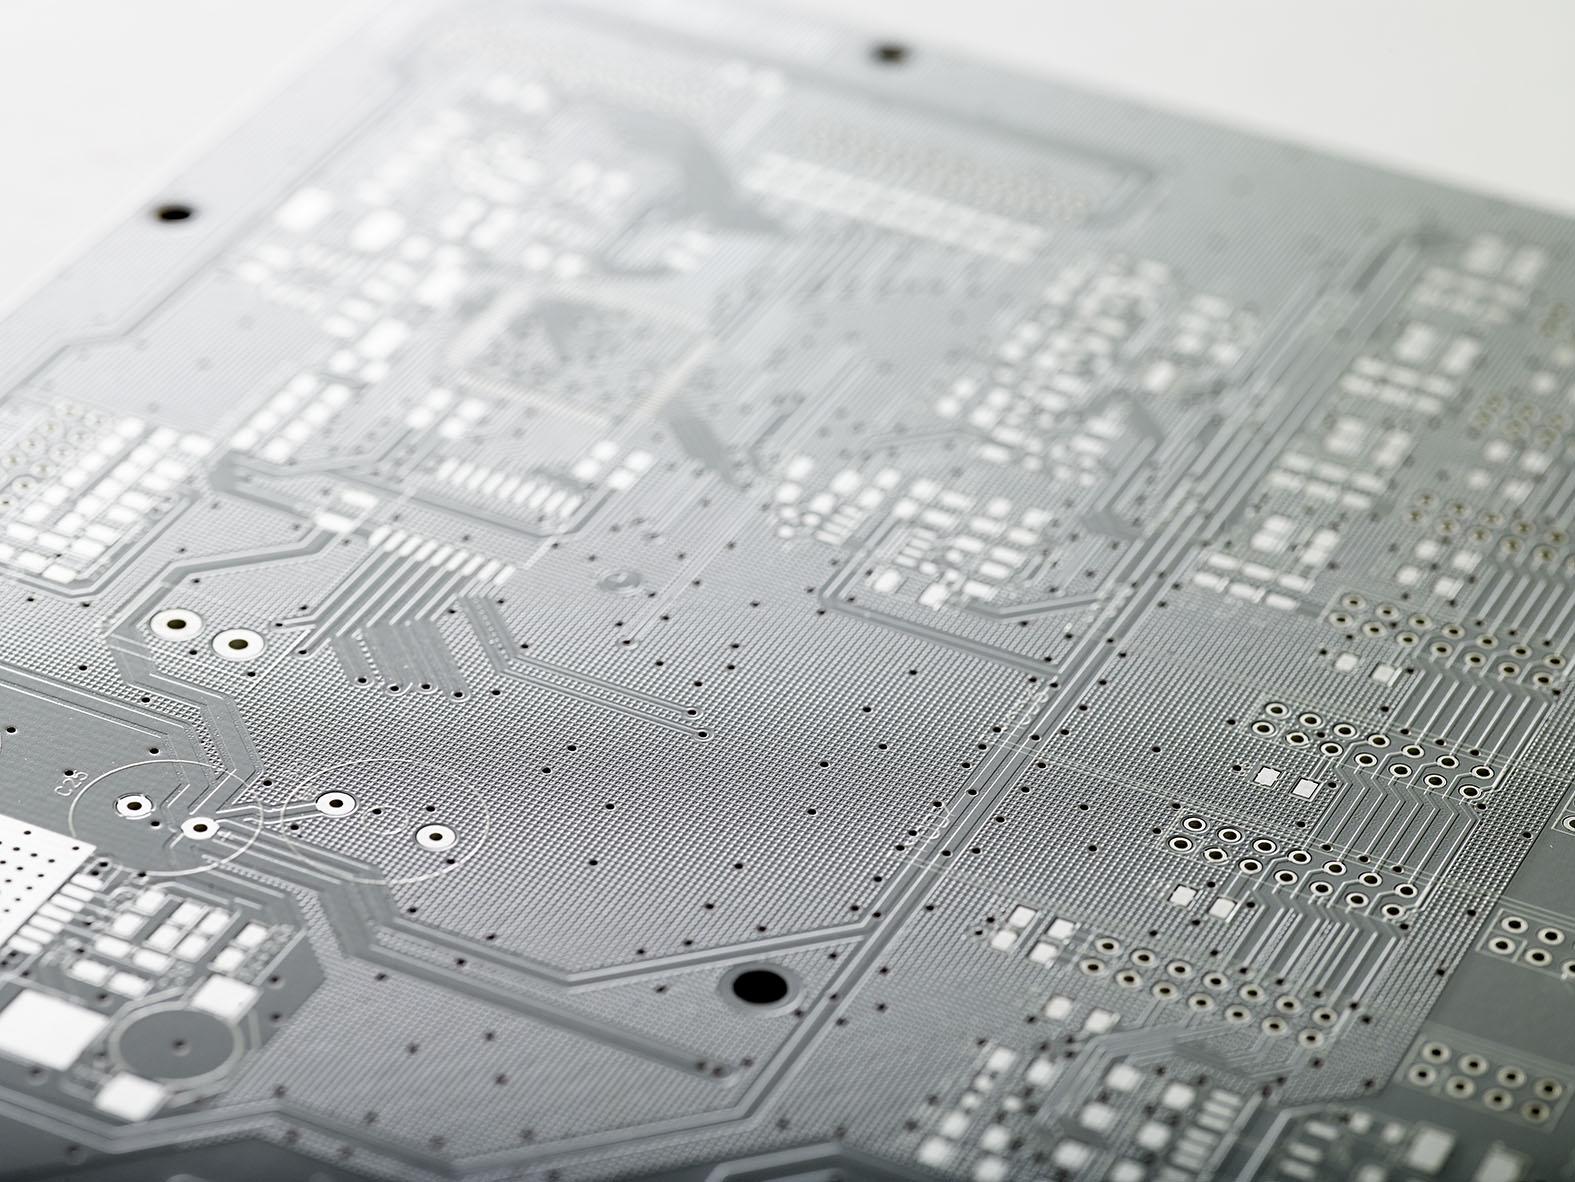 circuitos impresos monocapa, circuitos impresos doblecapa